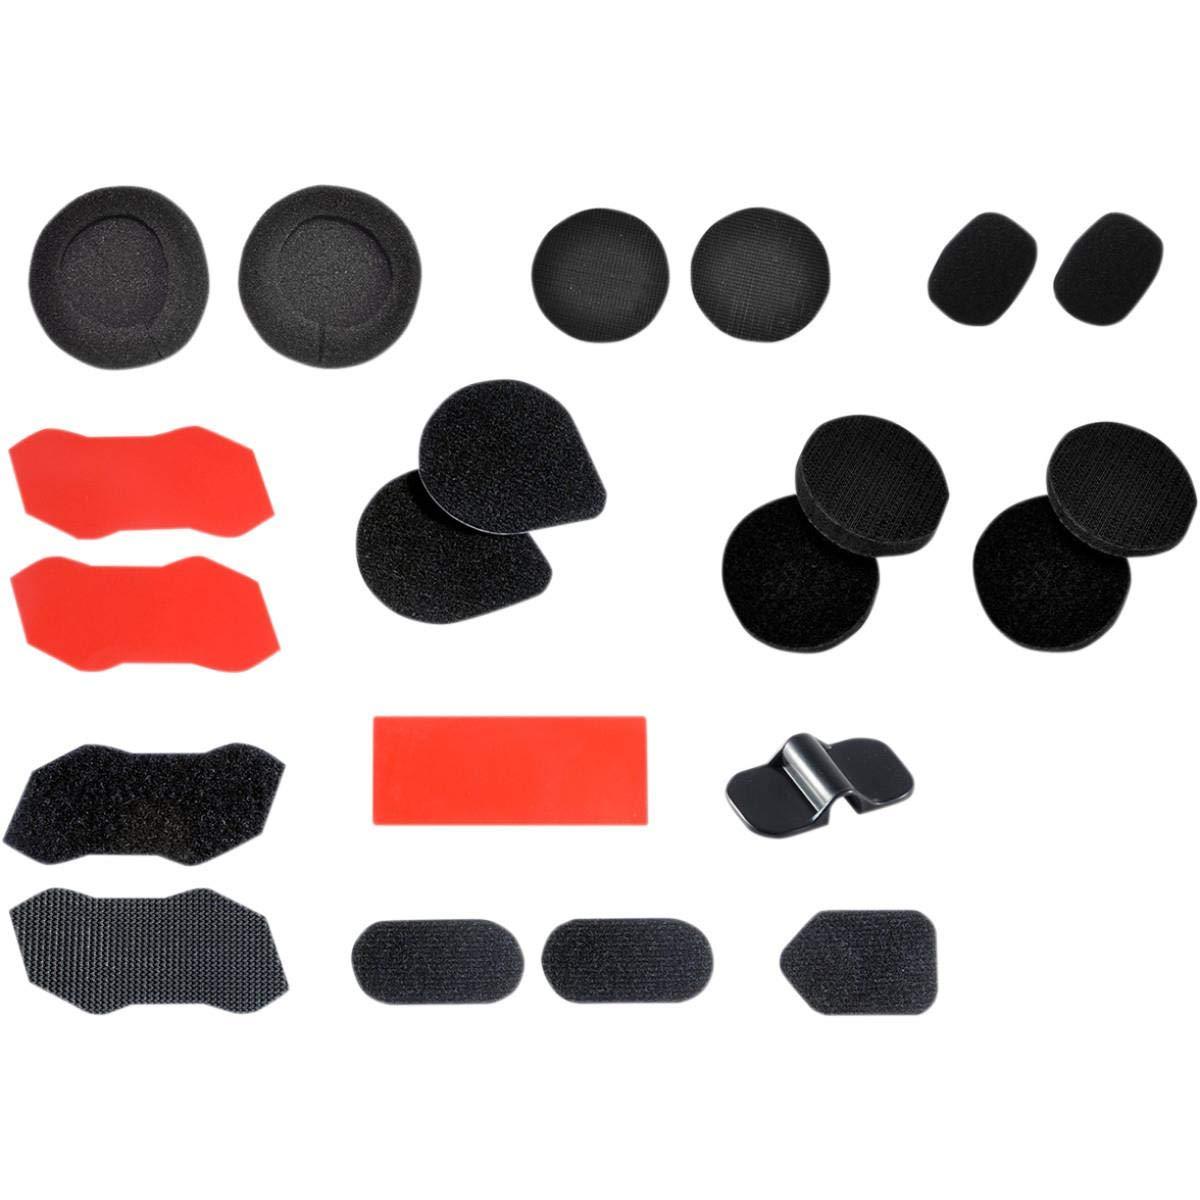 Sena Multi Color One Size 10R-A0201 10R Supplies Kit